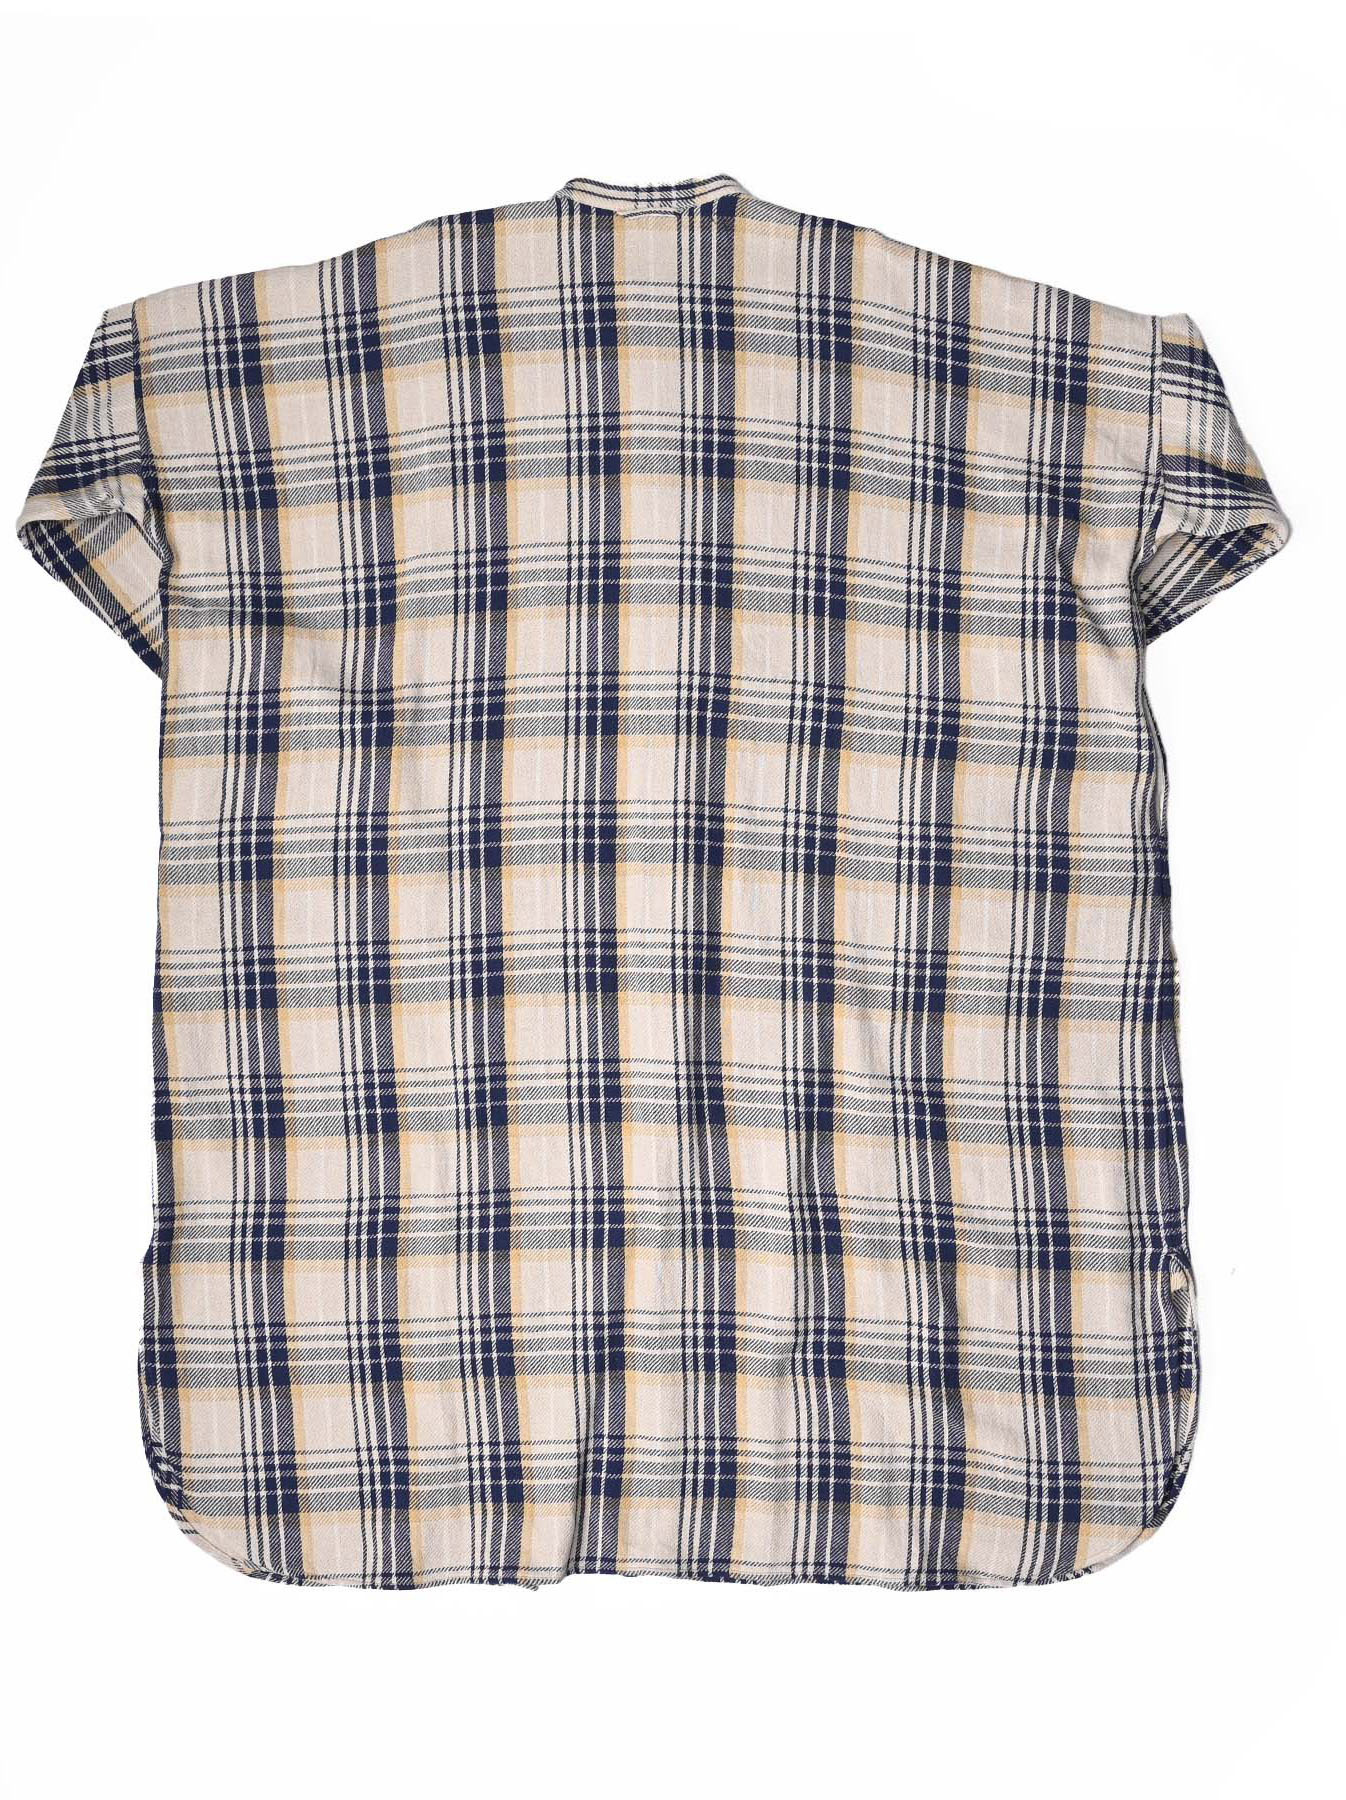 Indian Flannel Big Shirt-dress-6